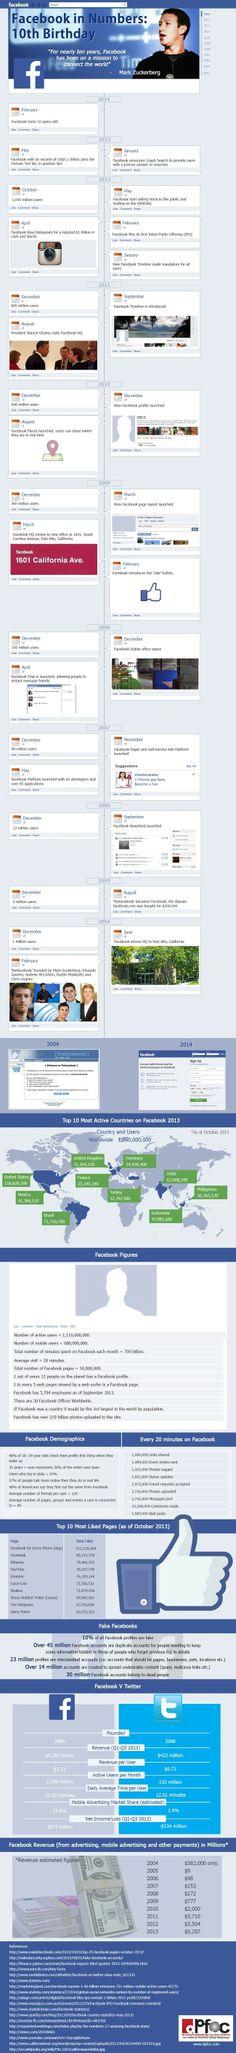 INFOGRAPHIC: Happy 10th Birthday Facebook!  / TechNews24h.com